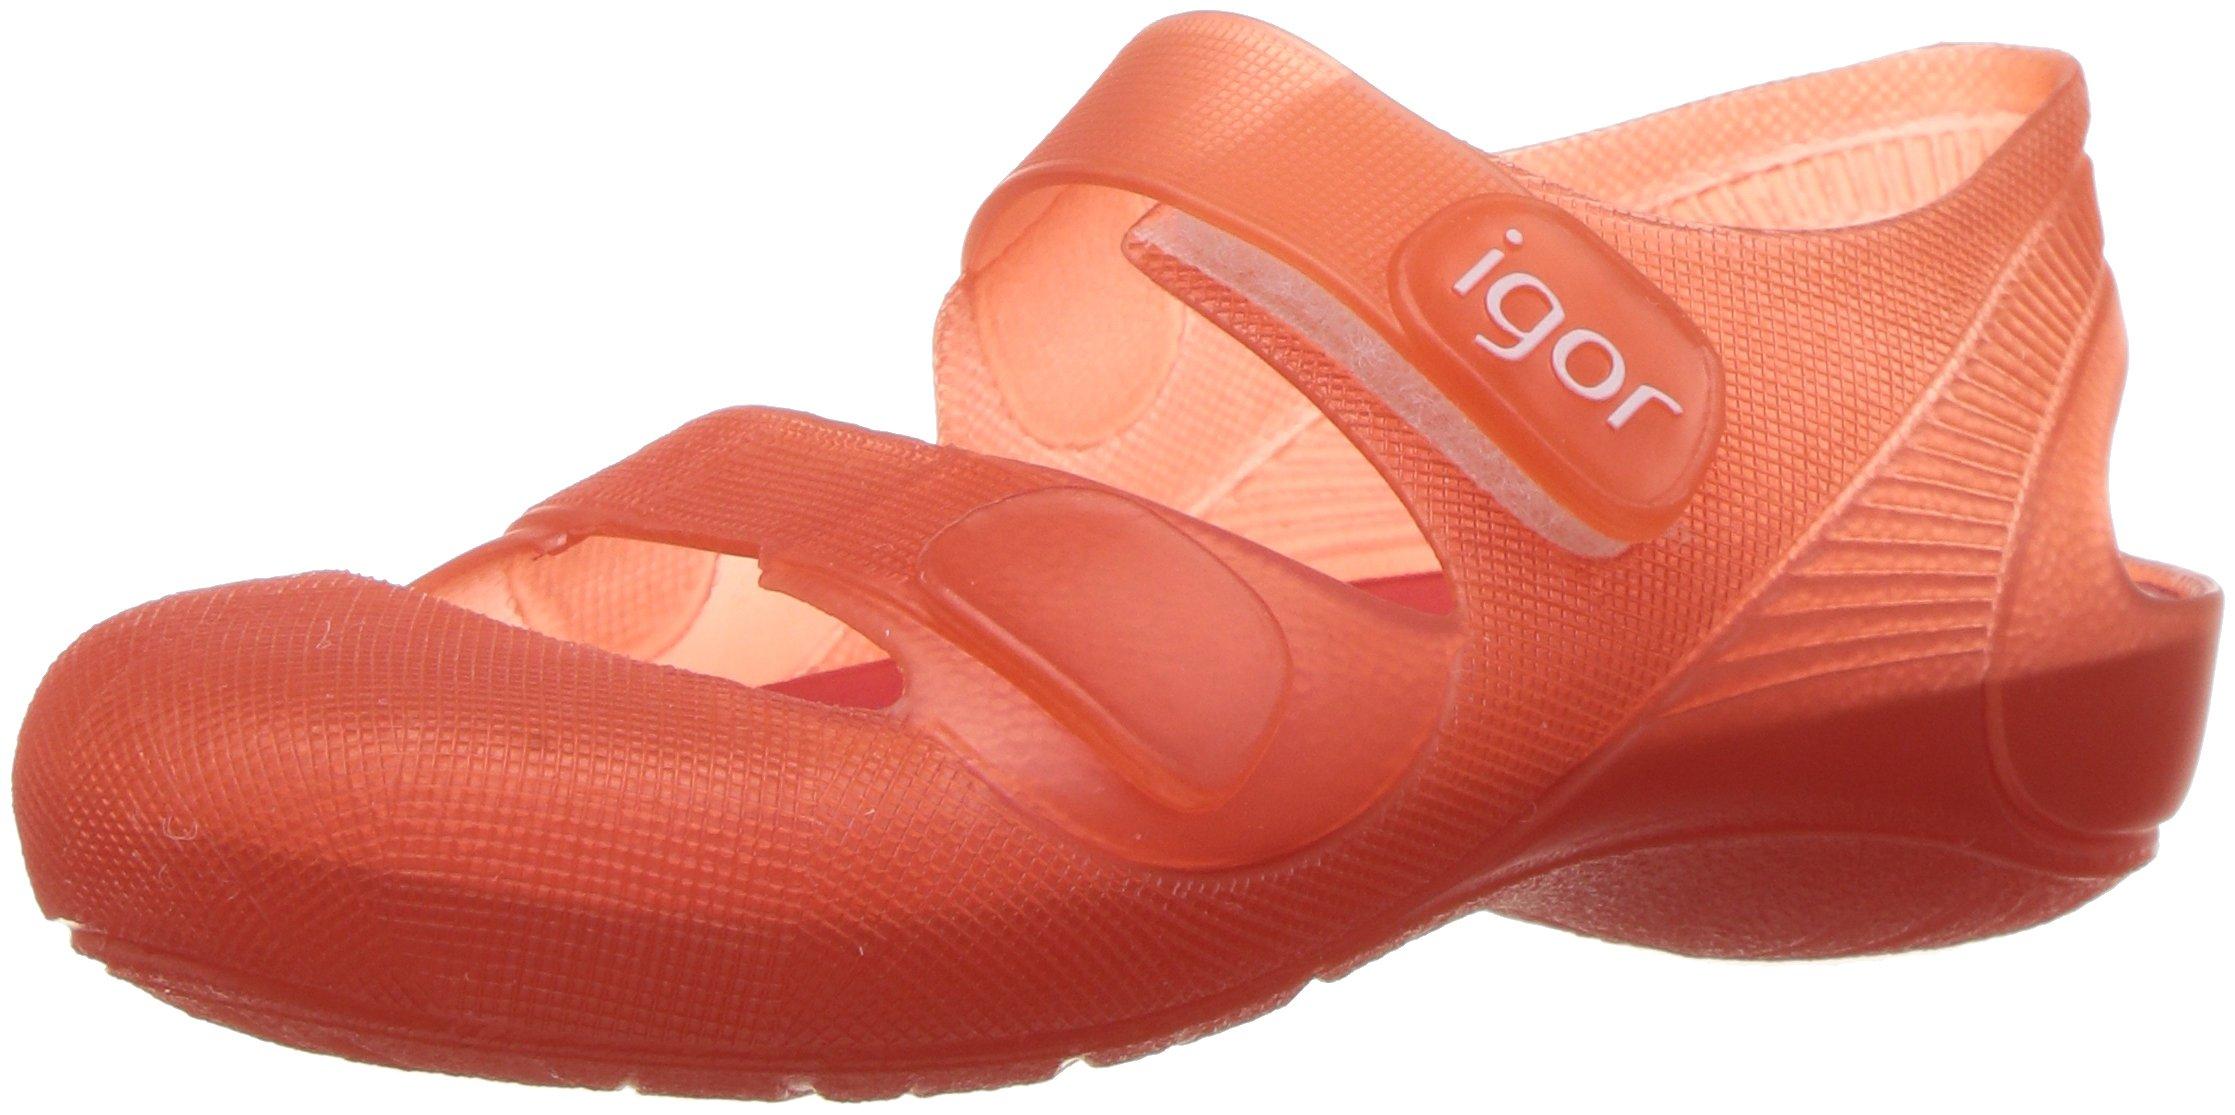 Igor Boys' S10110 Bondi Sandal, Red, 25 M EU/8 M US Toddler